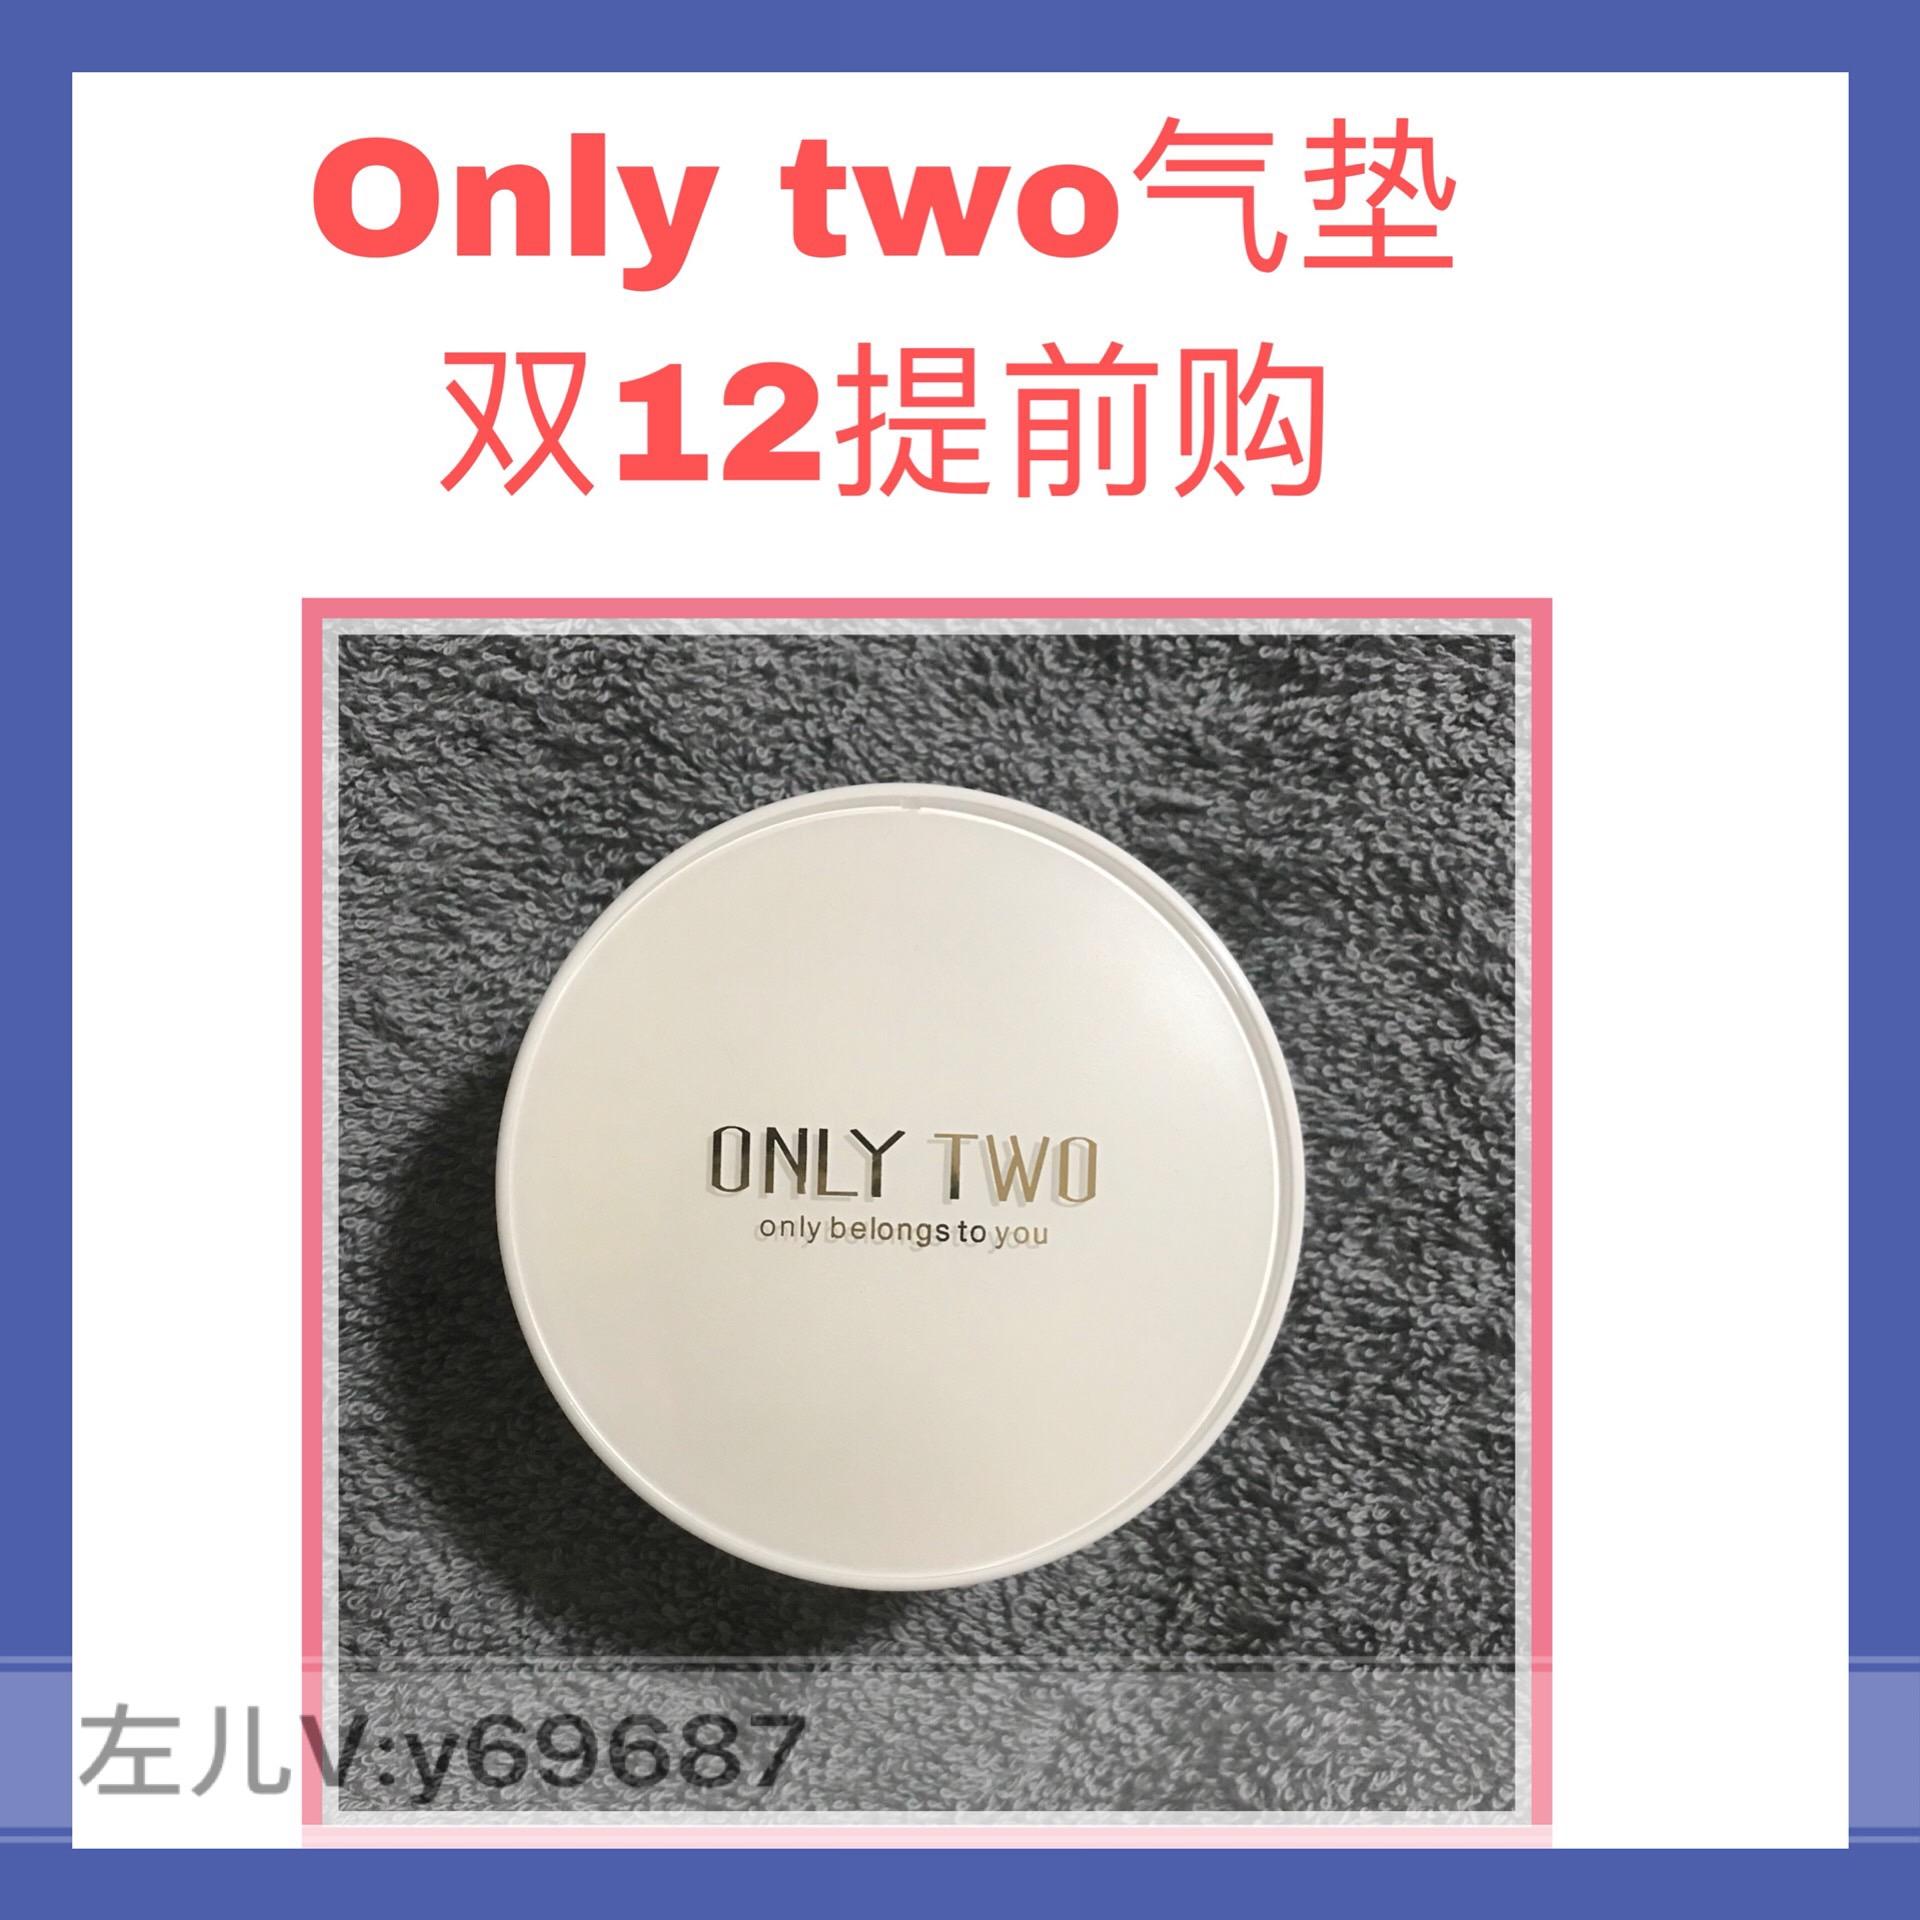 O2 ONLY TWO 真空氣墊BB霜保溼滋潤遮瑕隔離霜含玻尿酸